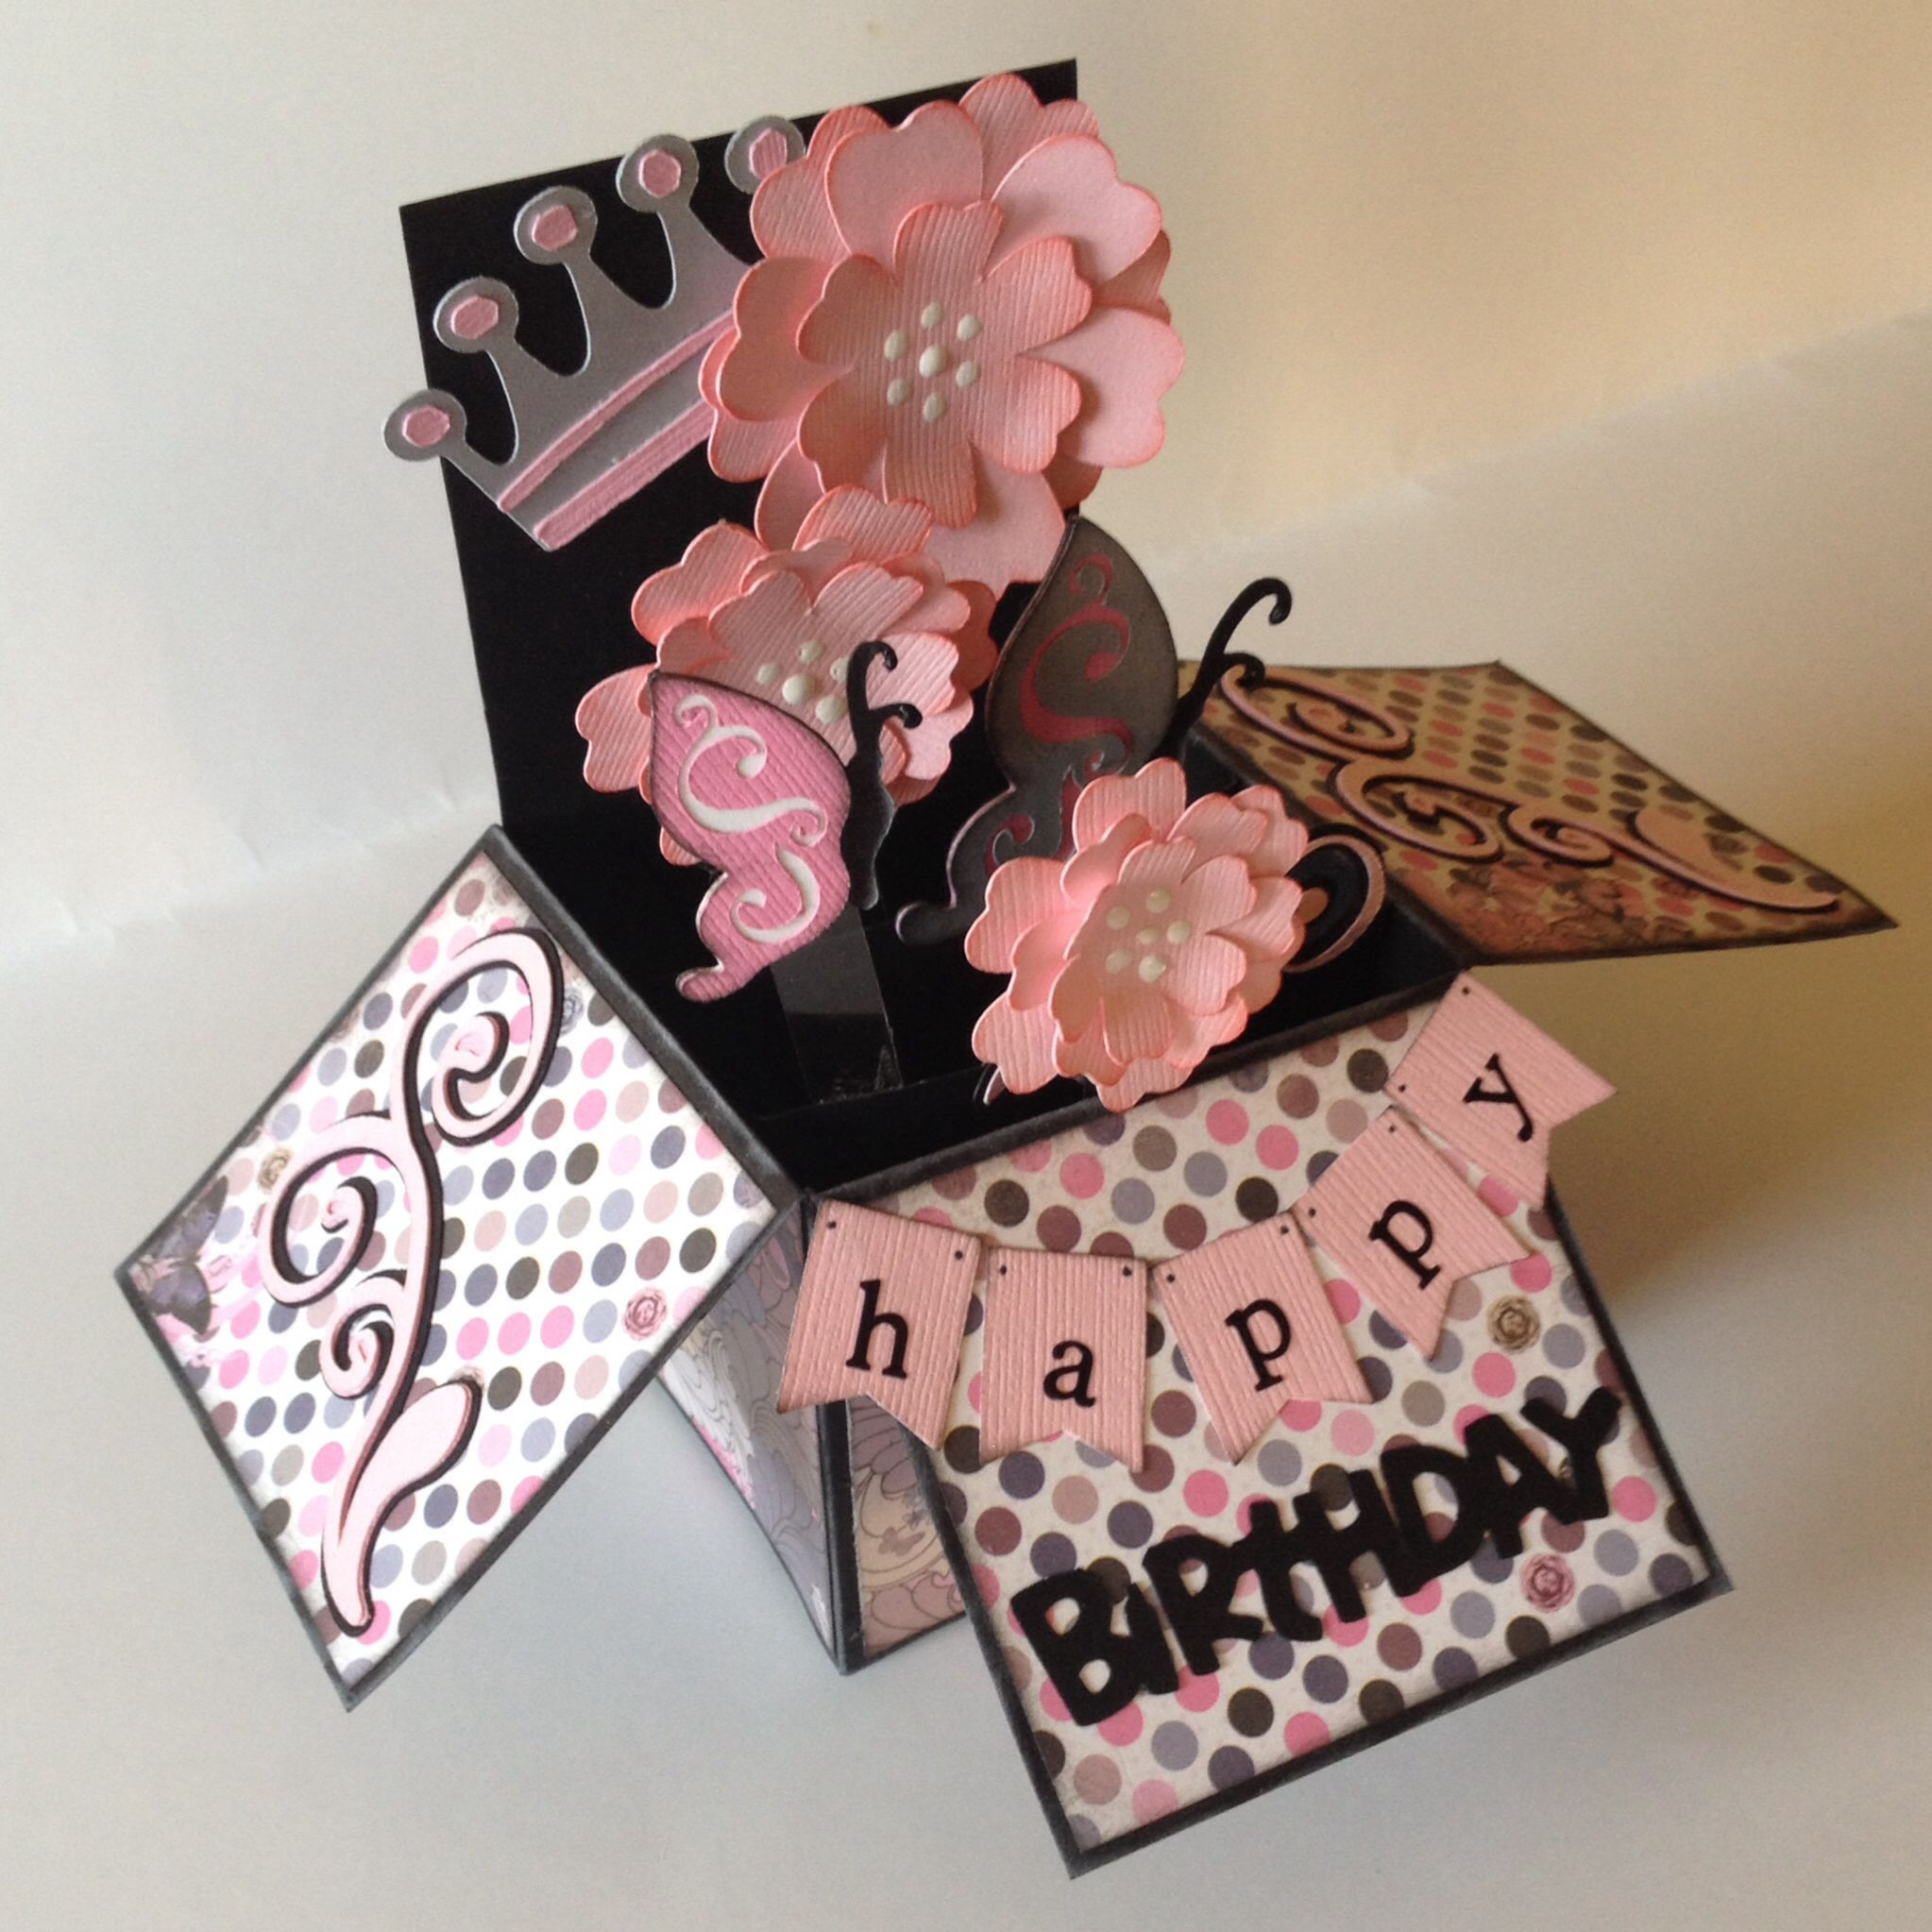 Happy Birthday Pop Up Box Card Card In A Box Pinterest Pop Up